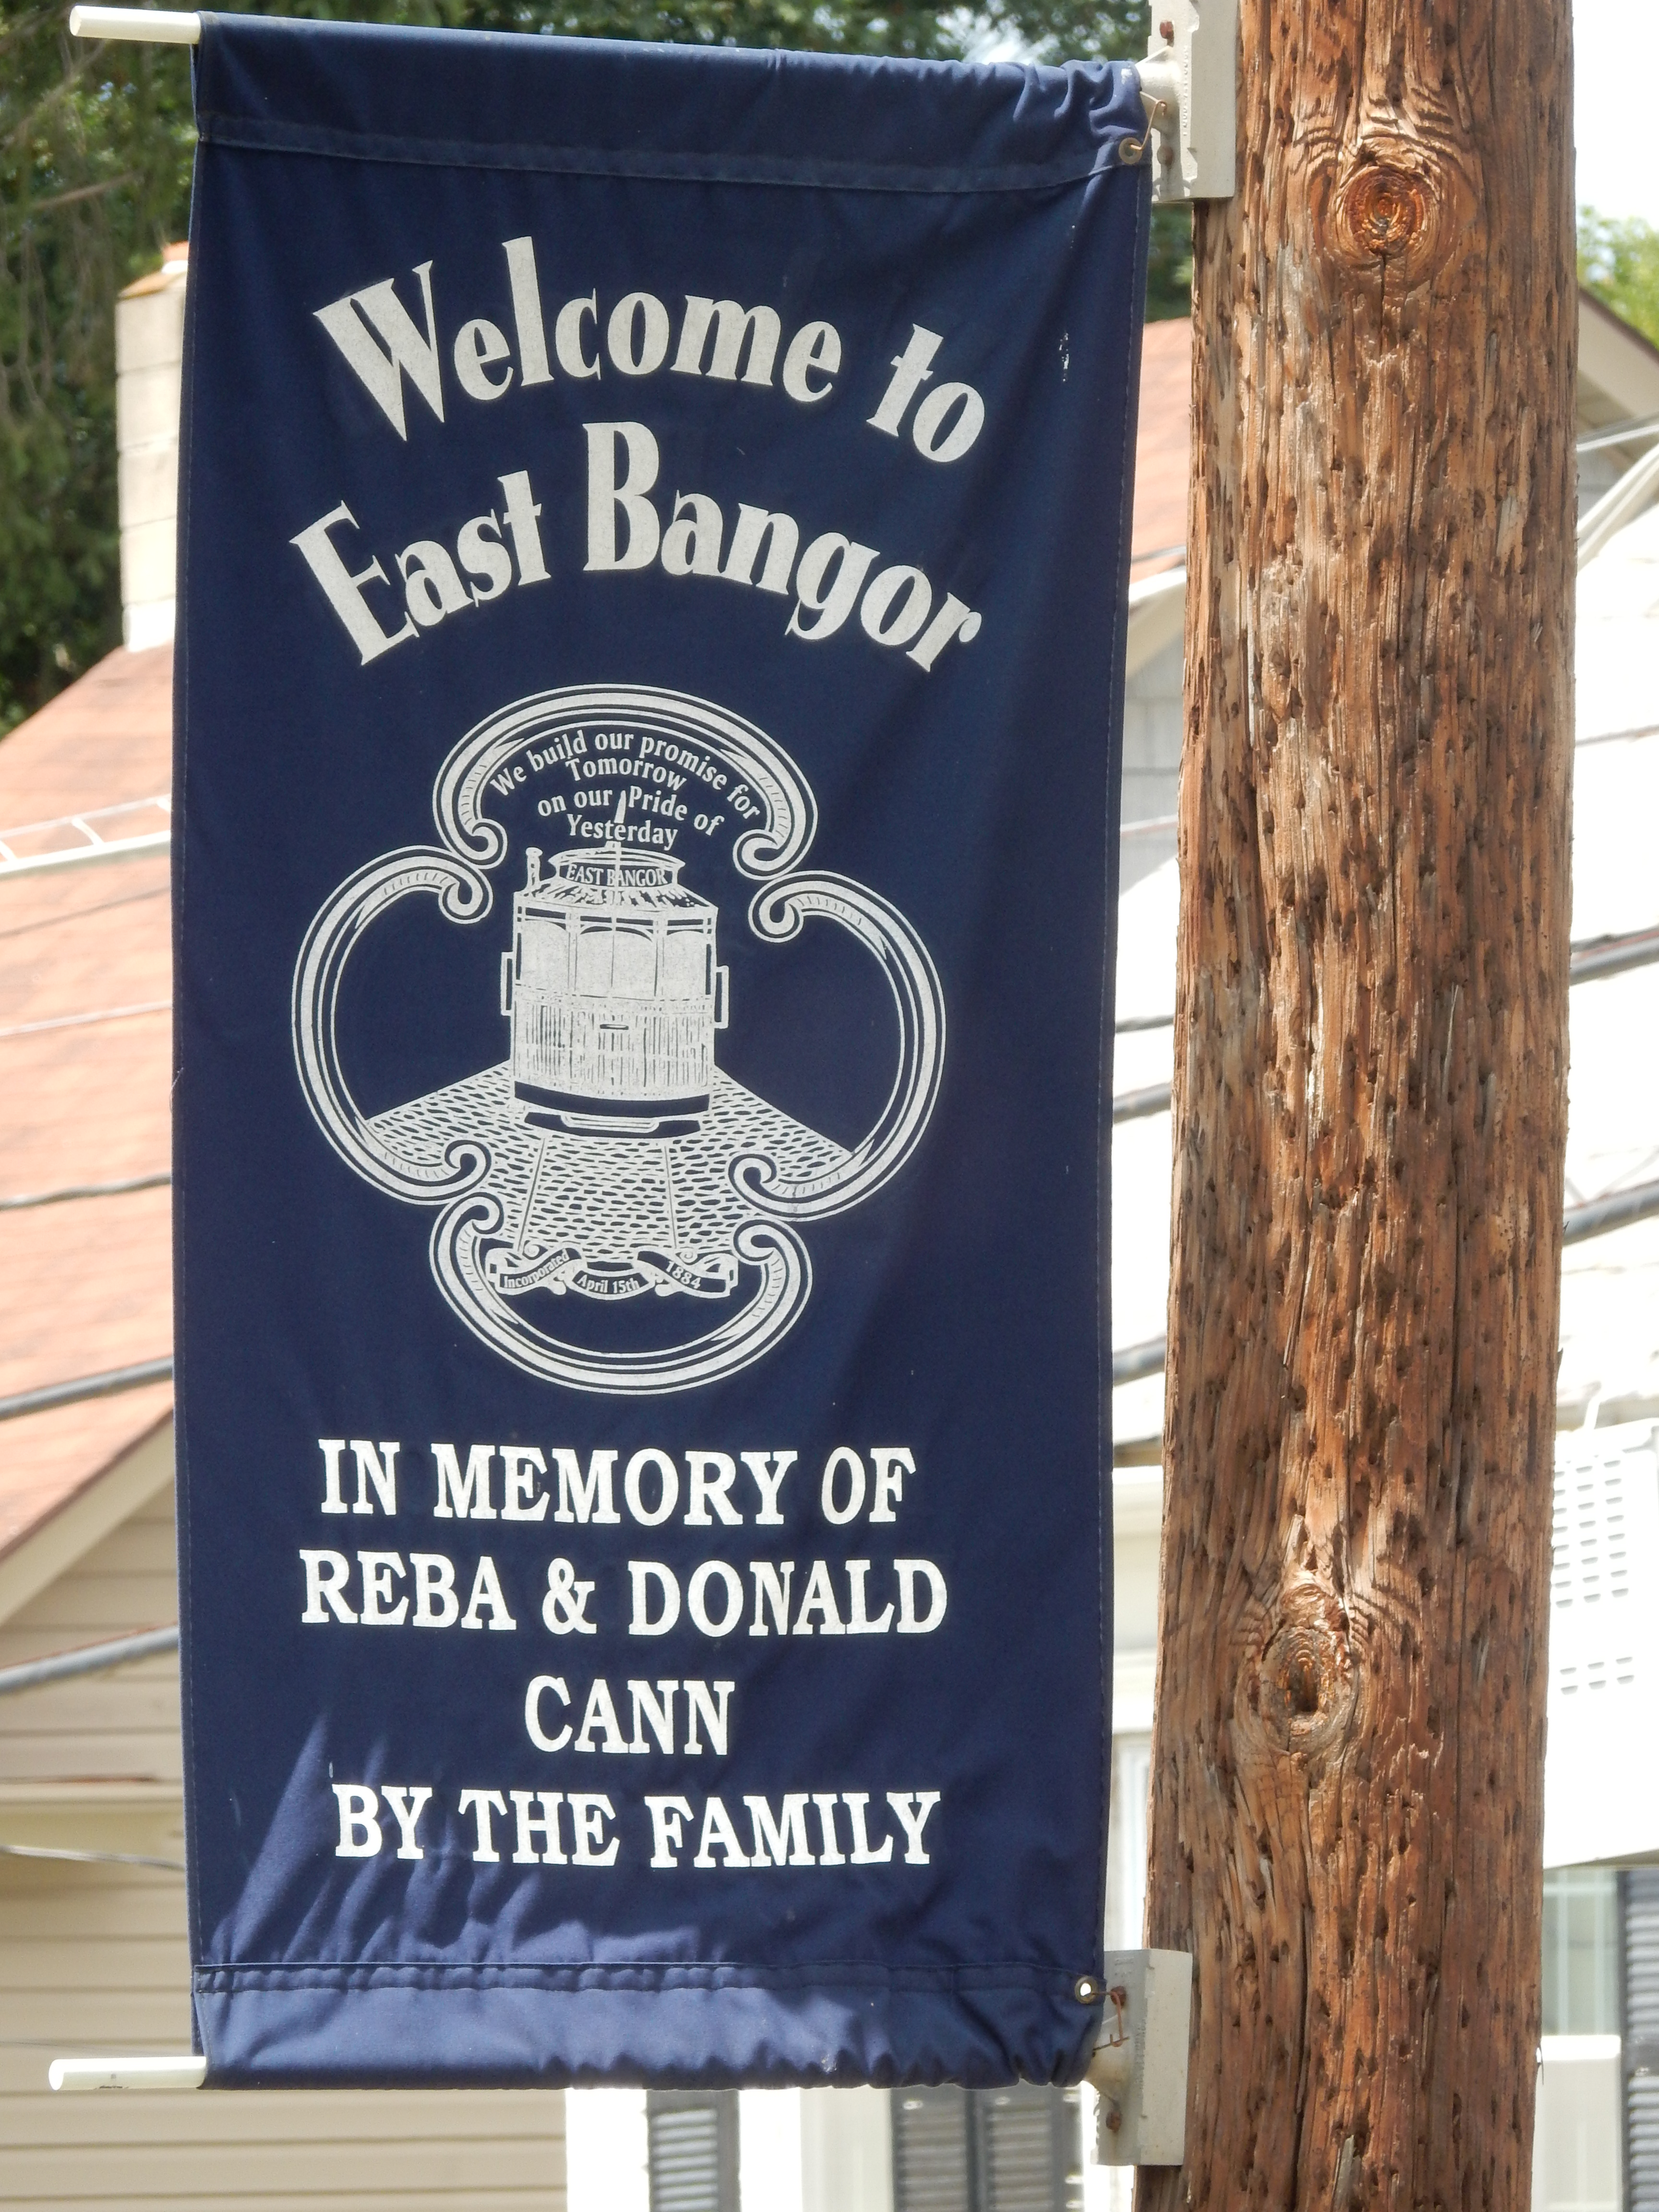 Swingers in east bangor pa